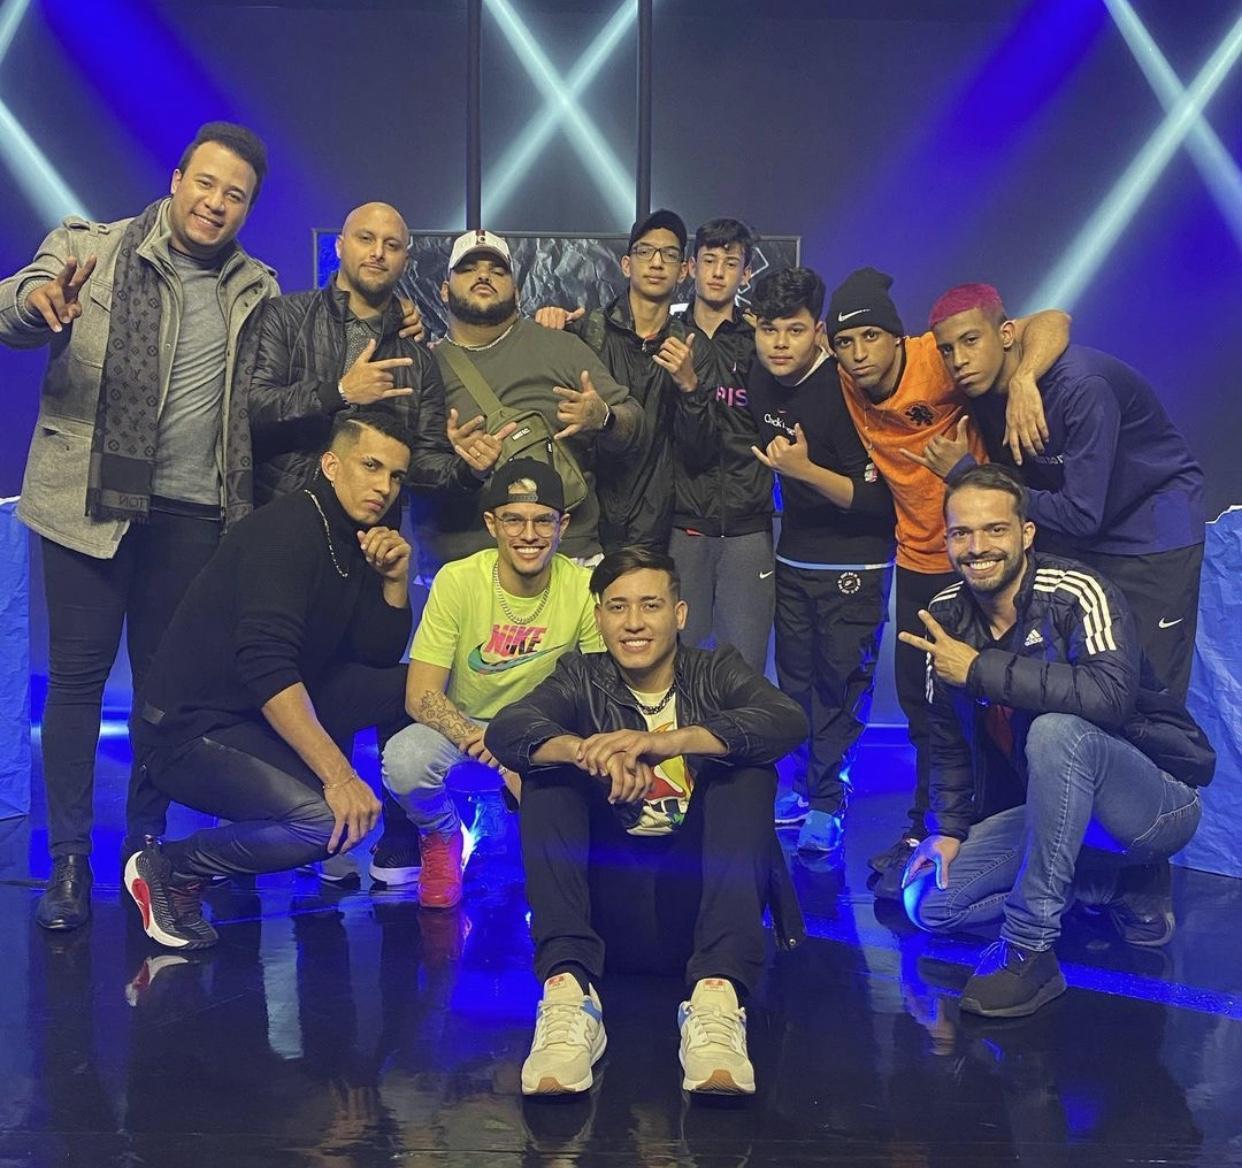 Equipe Medellin via Instagram - @medellingames